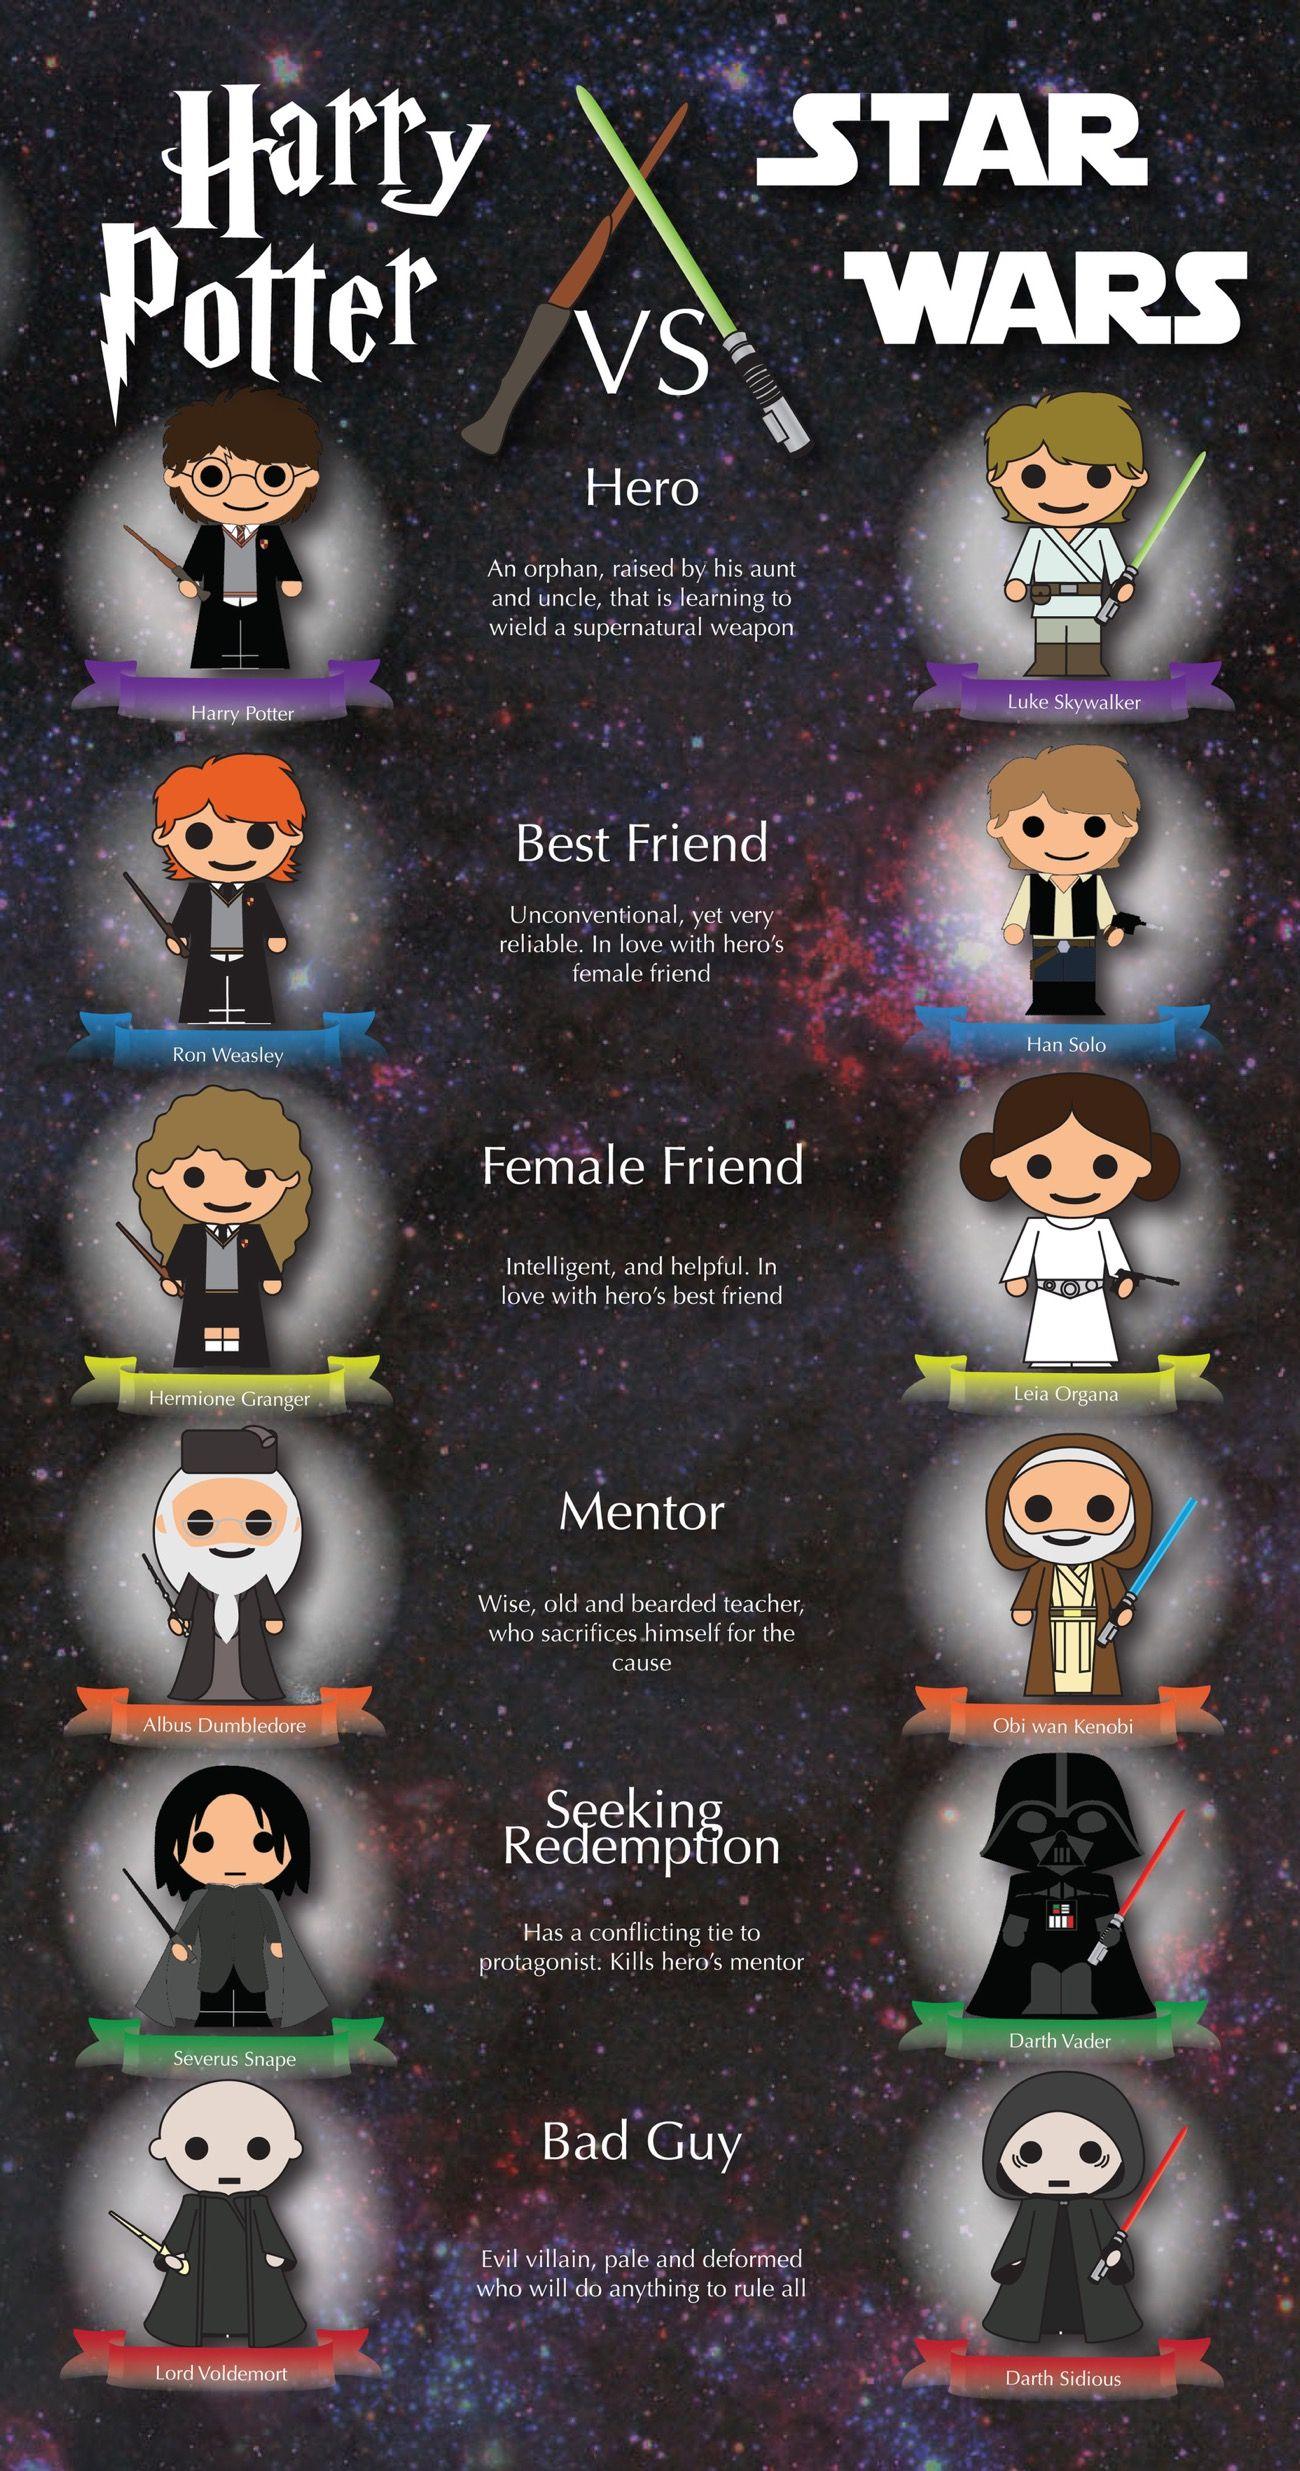 Harry Potter Vs Star Wars Infographic Harry Potter Jokes Harry Potter Quotes Harry Potter Puns